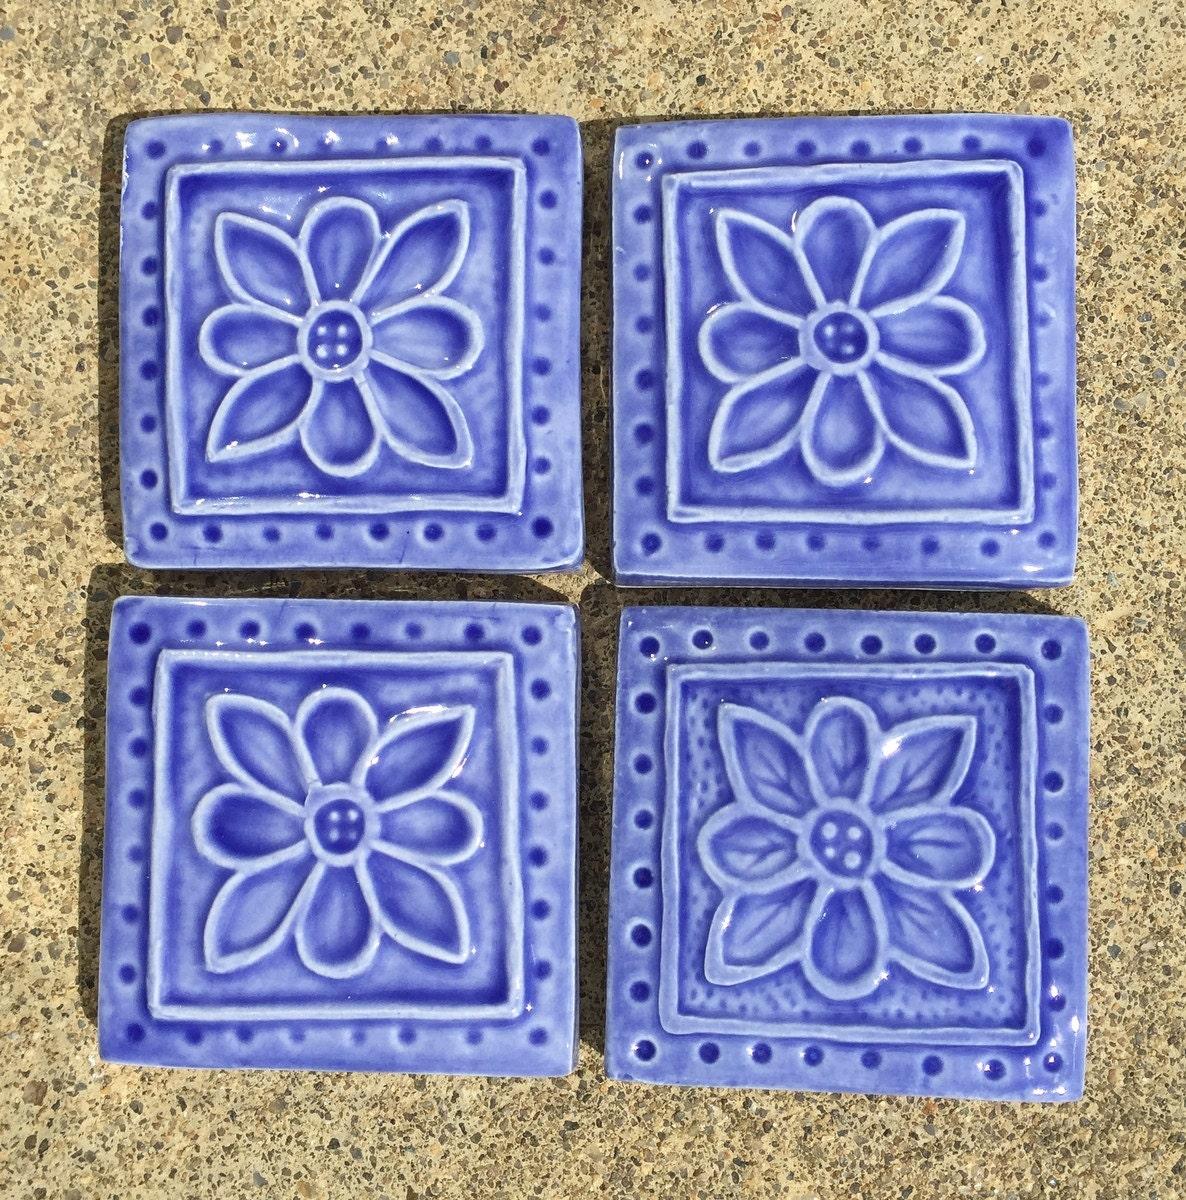 Ceramic tile decorative accents